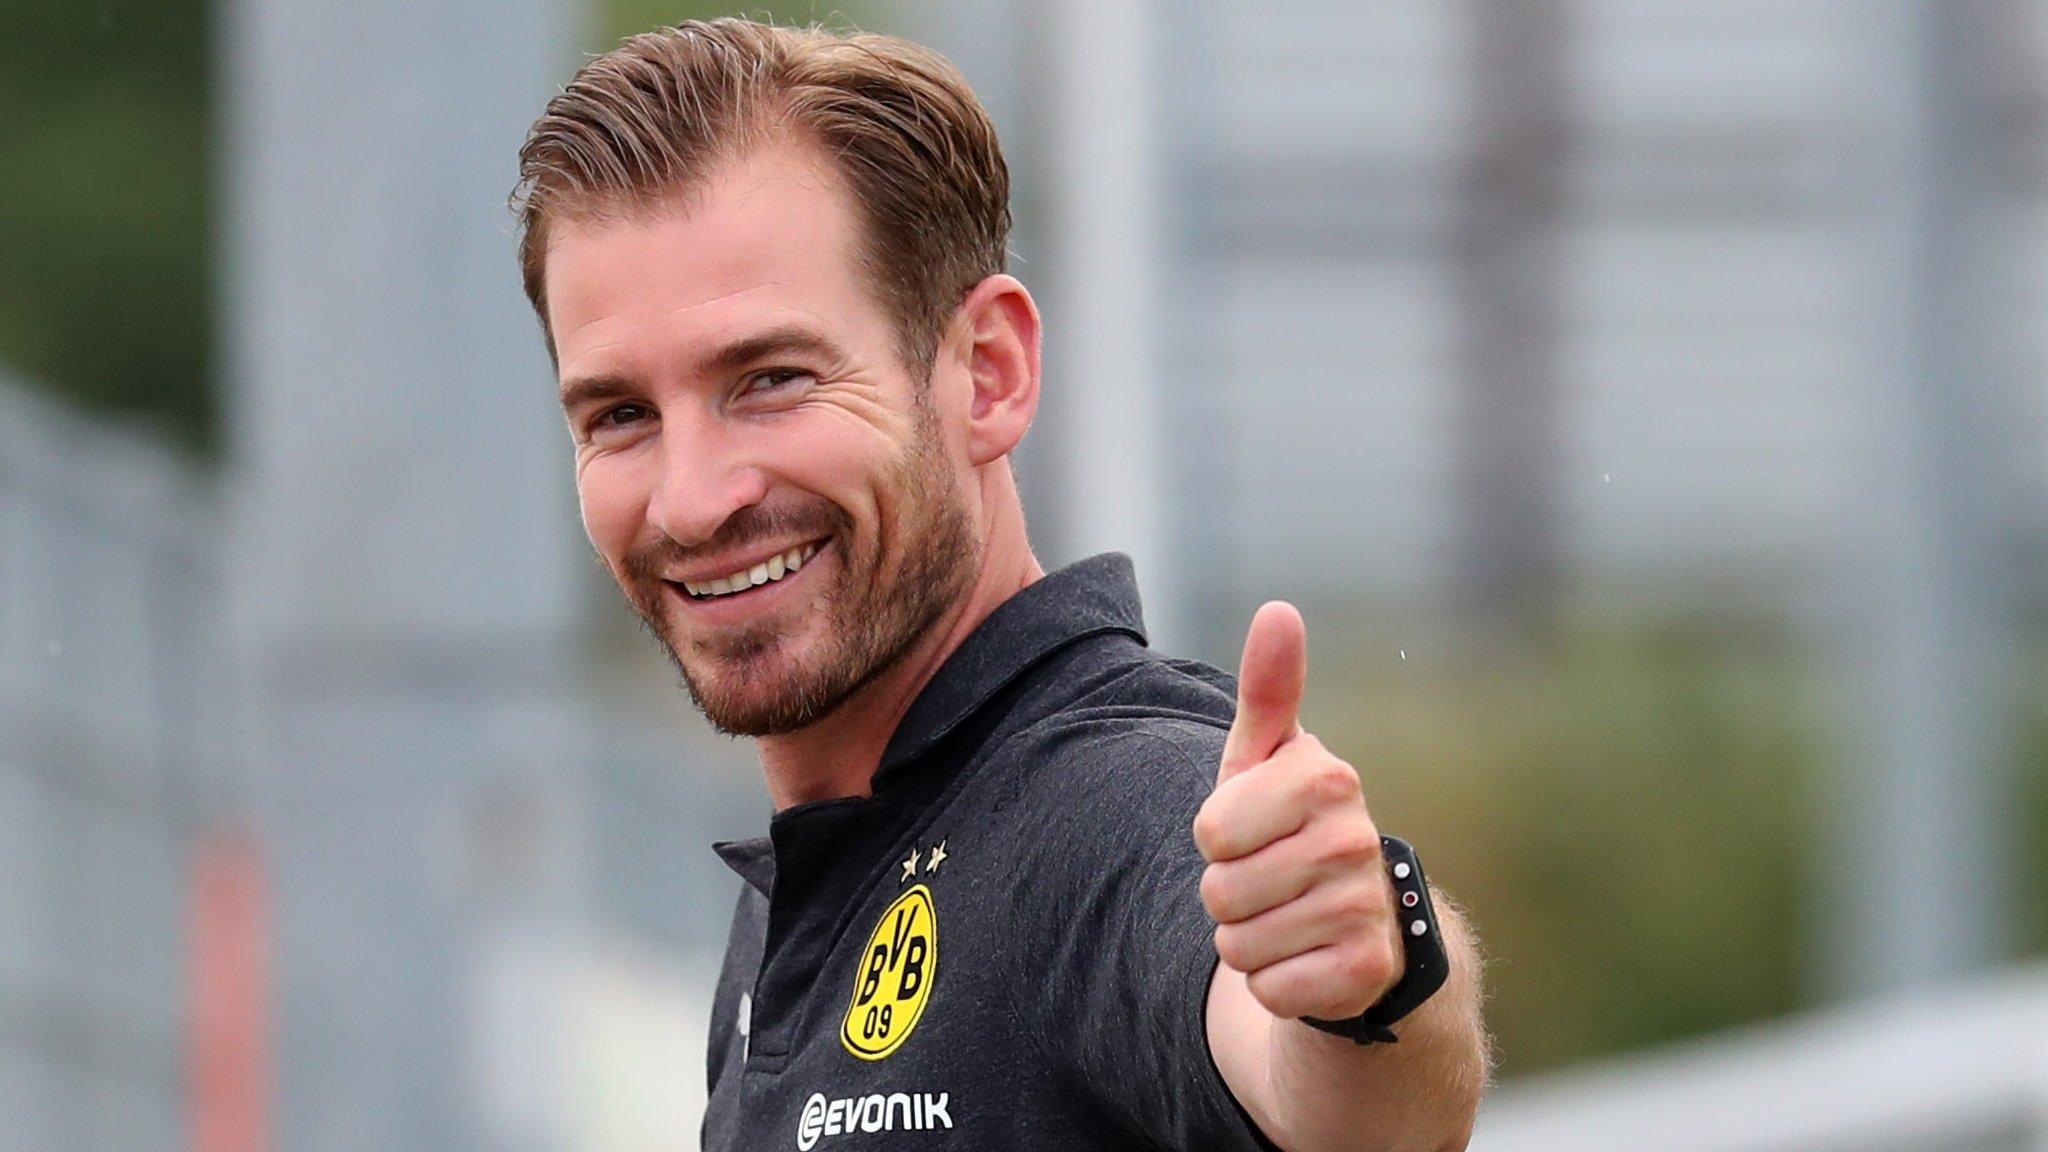 Huddersfield Town appoint Jan Siewert from Borussia Dortmund as new manager